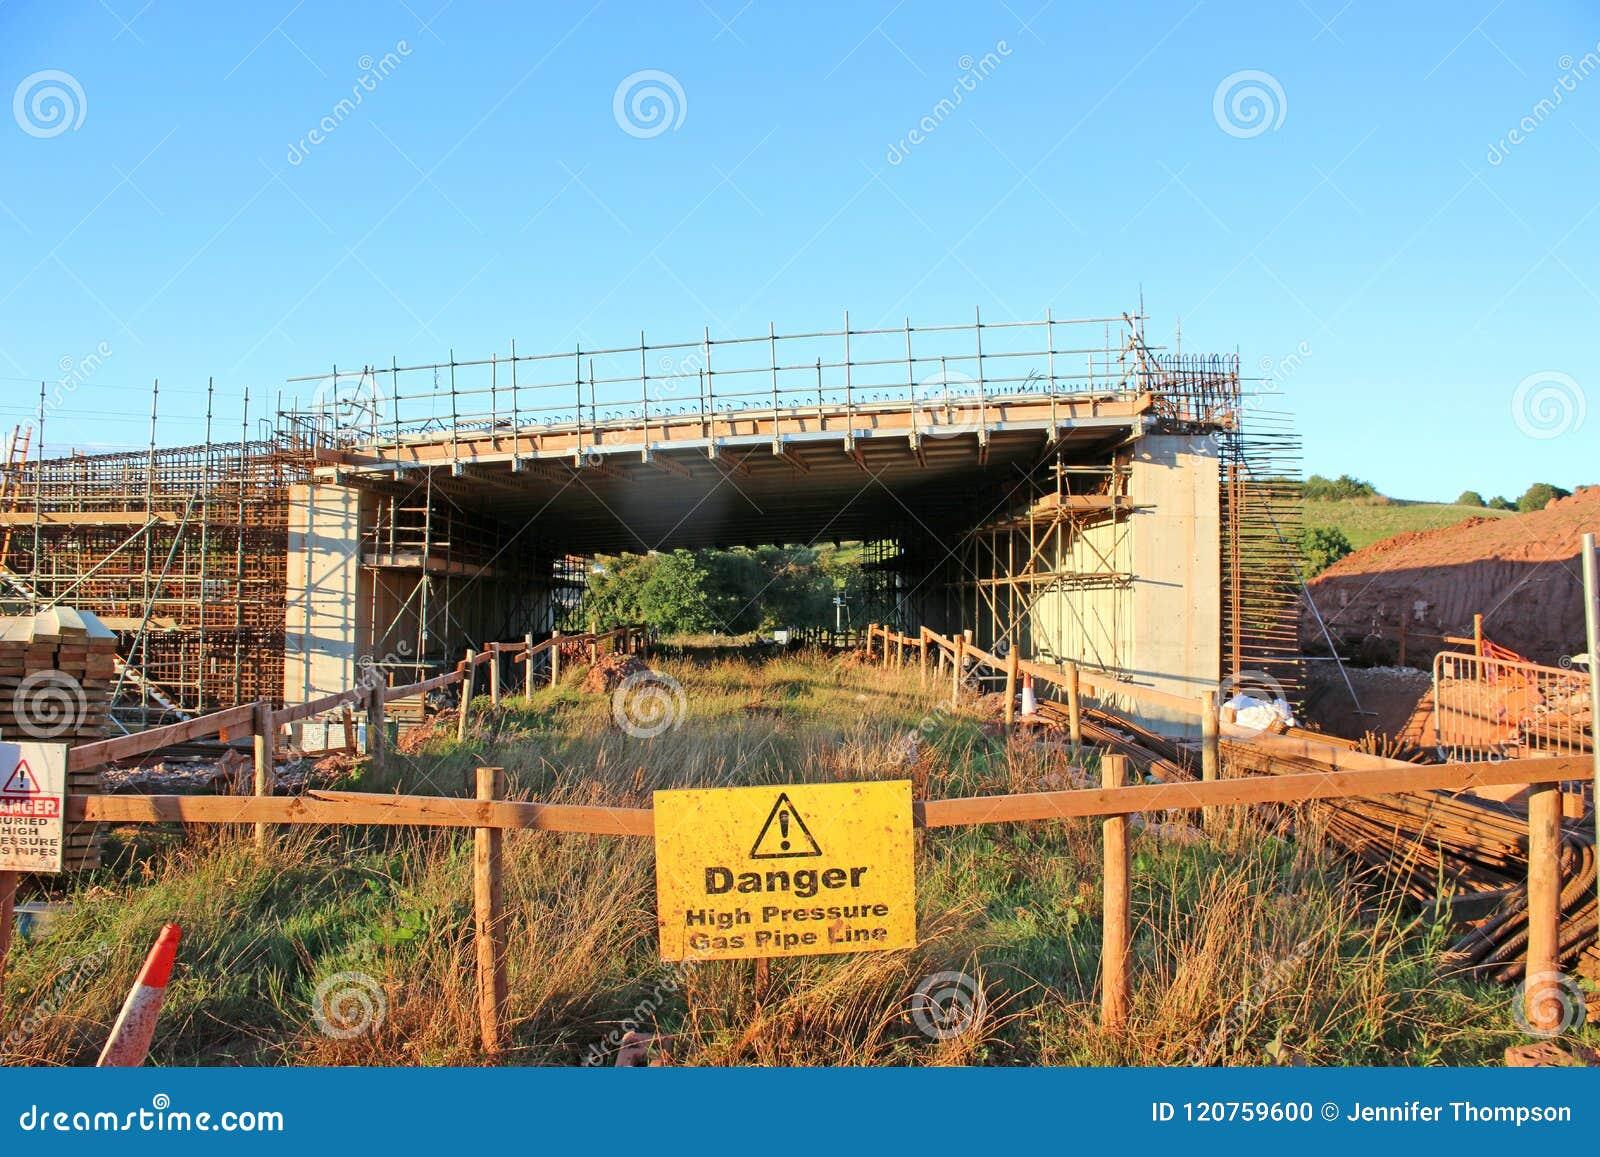 Road Bridge Under Construction Stock Photo - Image of pipes, gravel